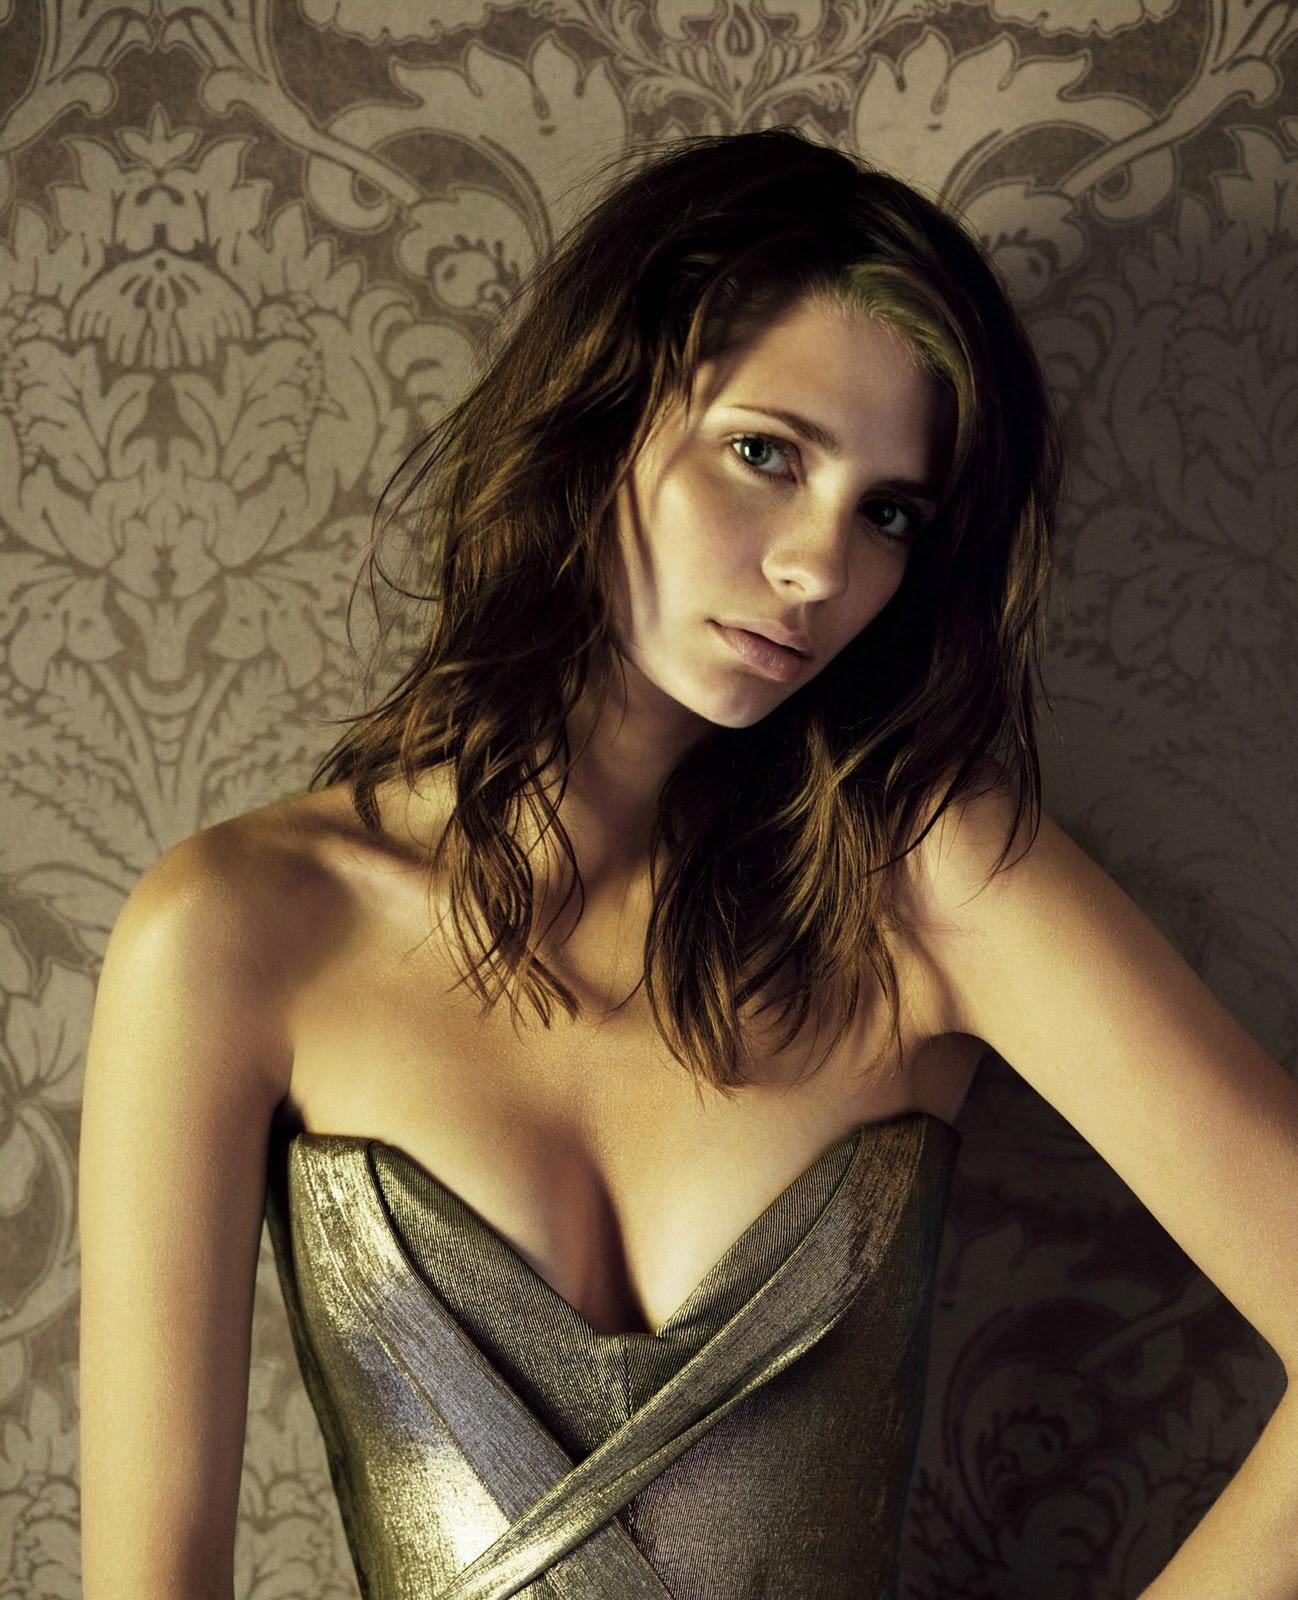 Top model bugil: Mischa Barton ... Amazing Sexy Woman